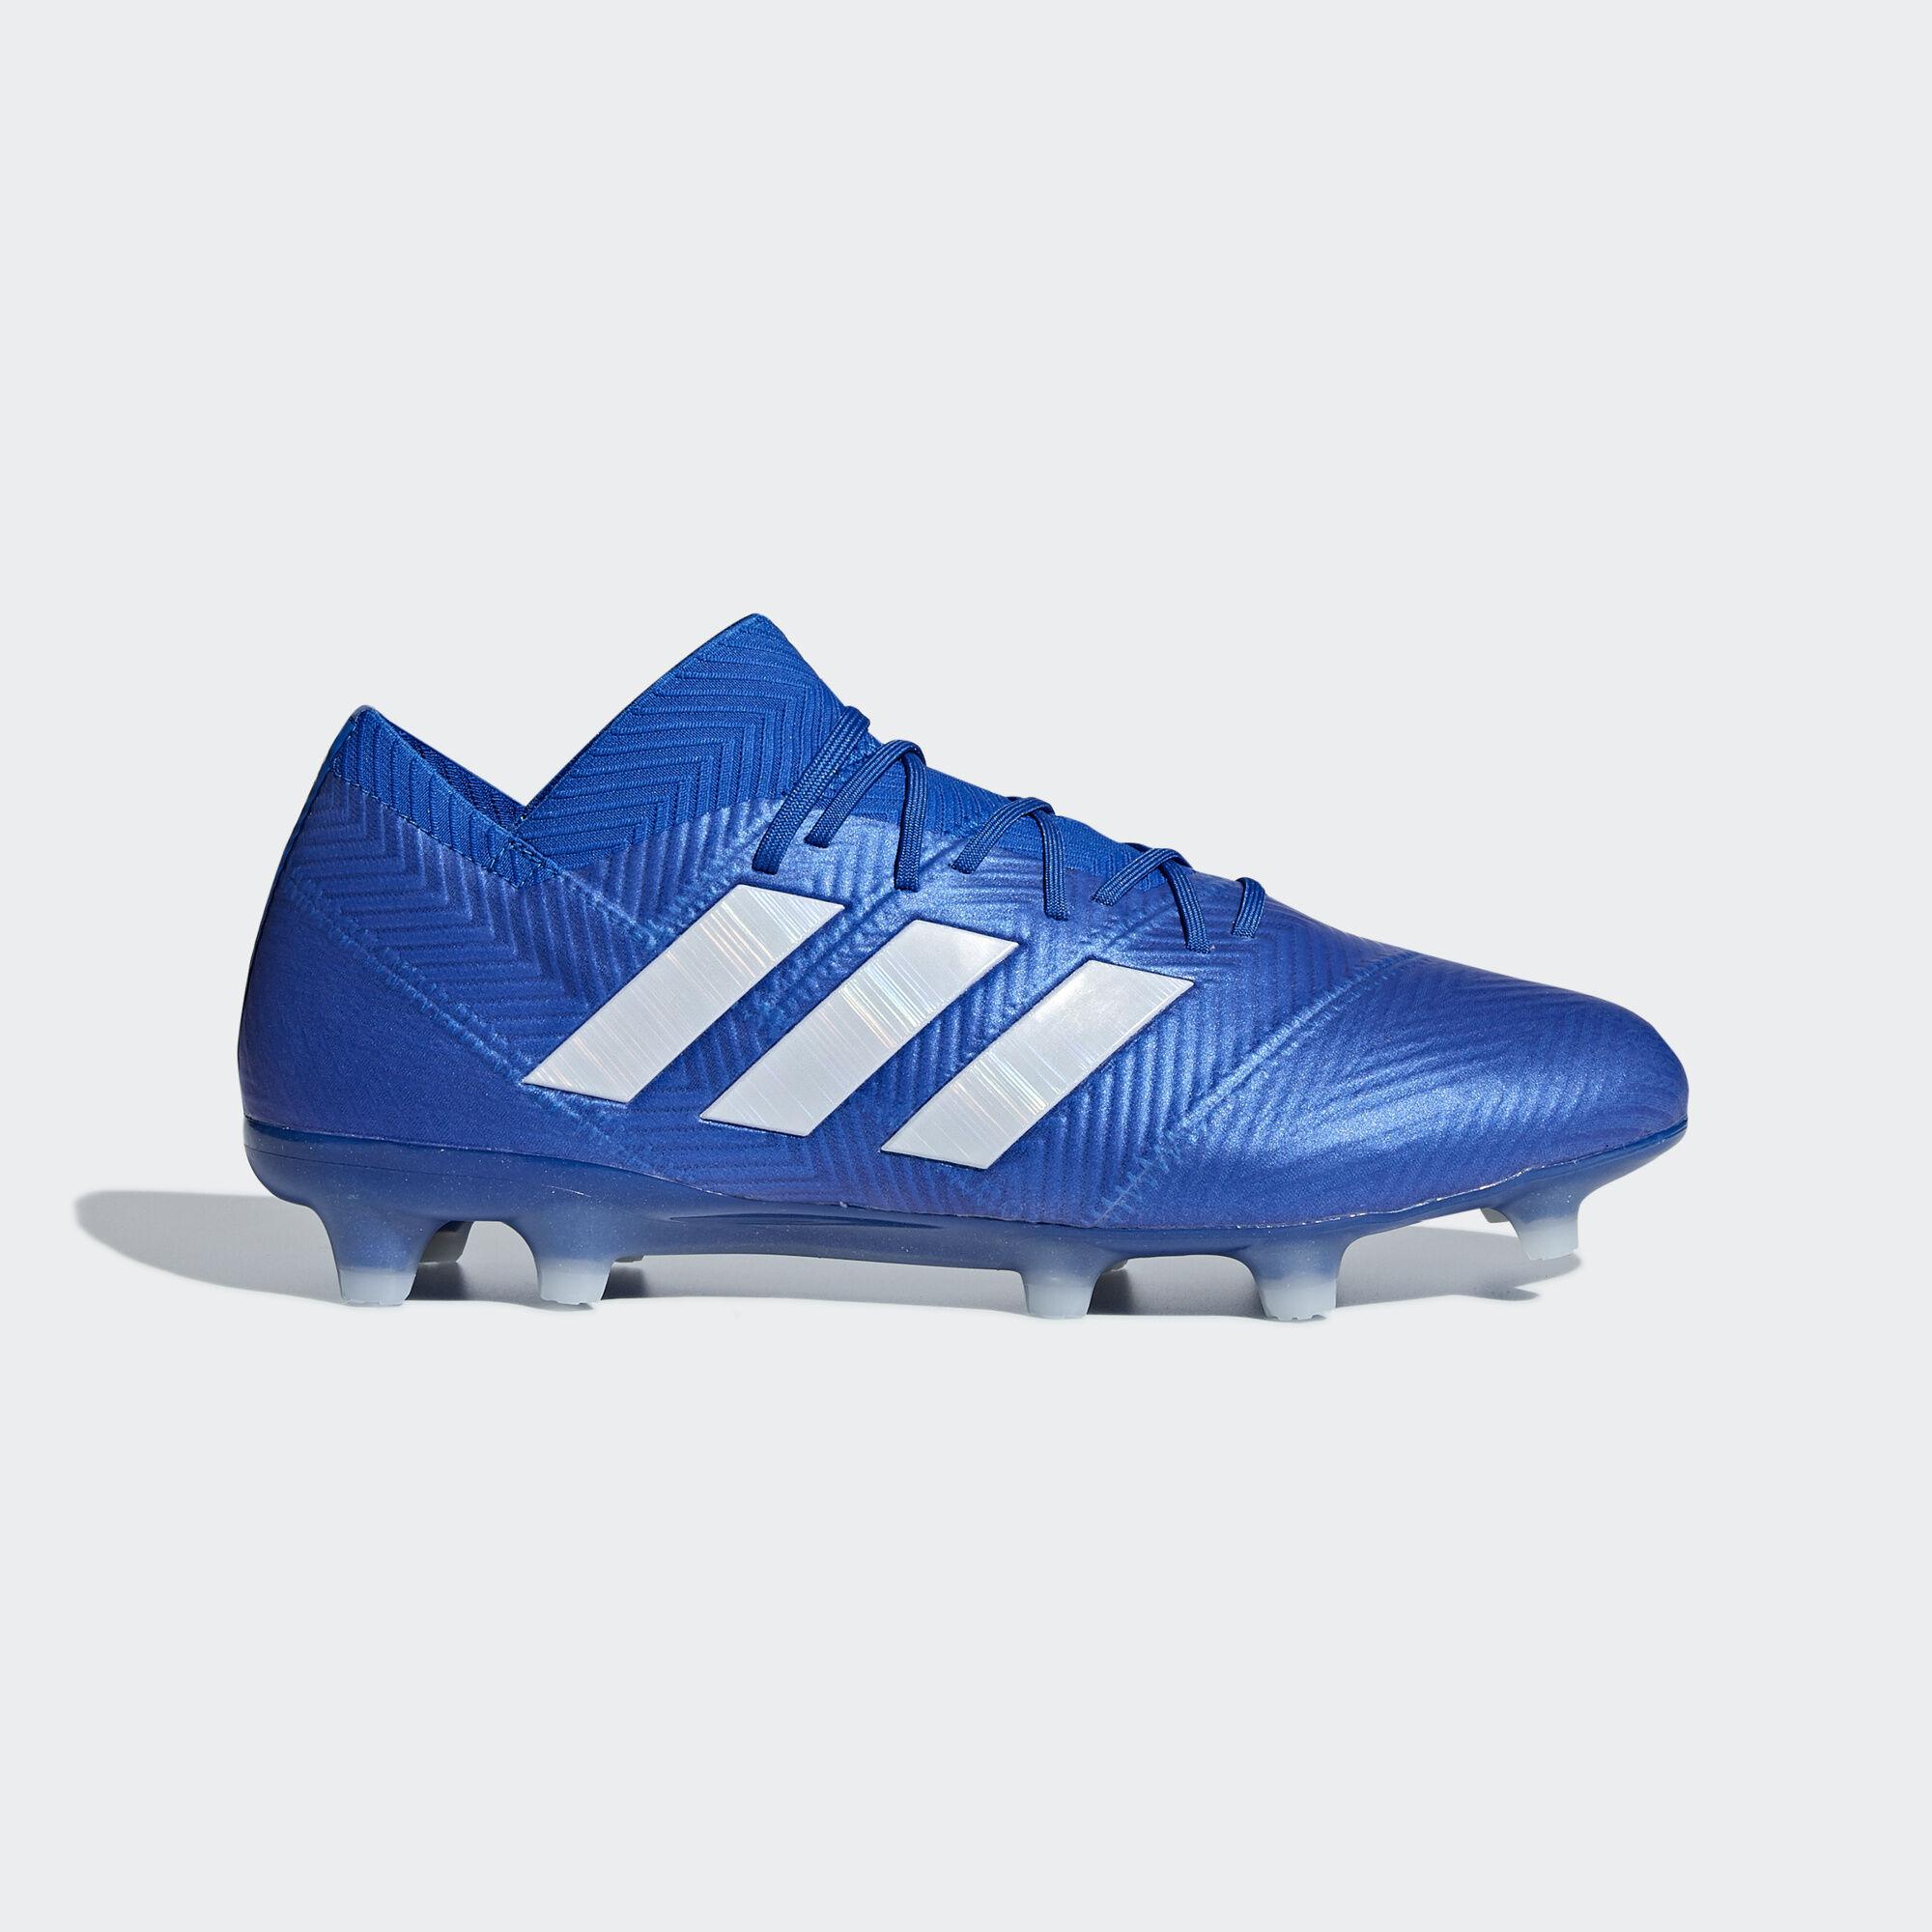 adidas - Nemeziz 18.1 Firm Ground Boots Football Blue   Ftwr White   Football  Blue DB2080 6af01ea21156